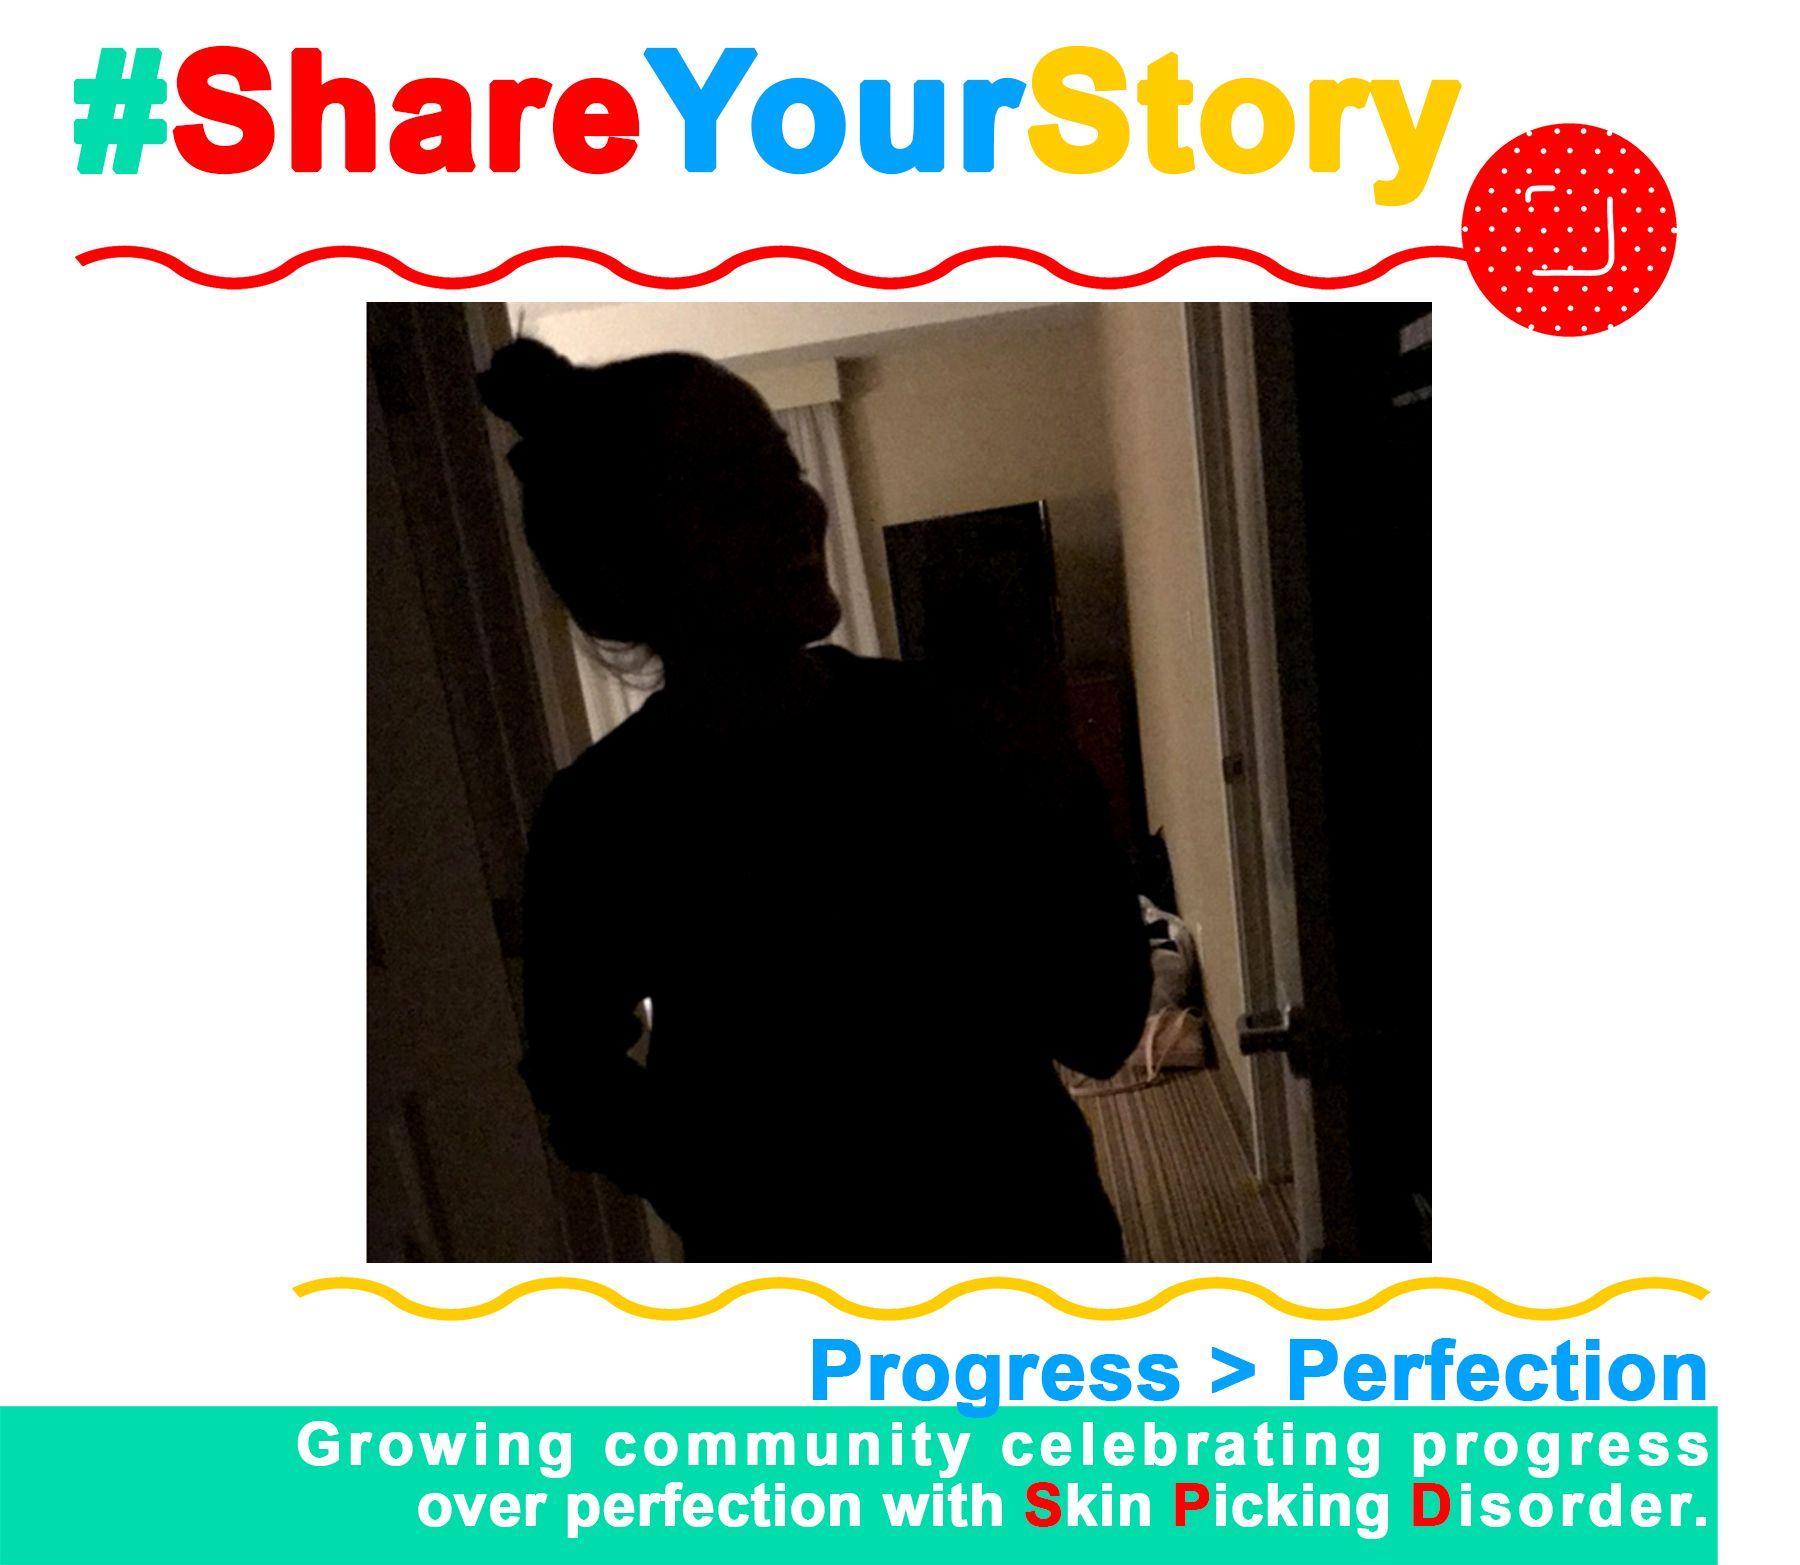 #ShareYourStory: Amanda